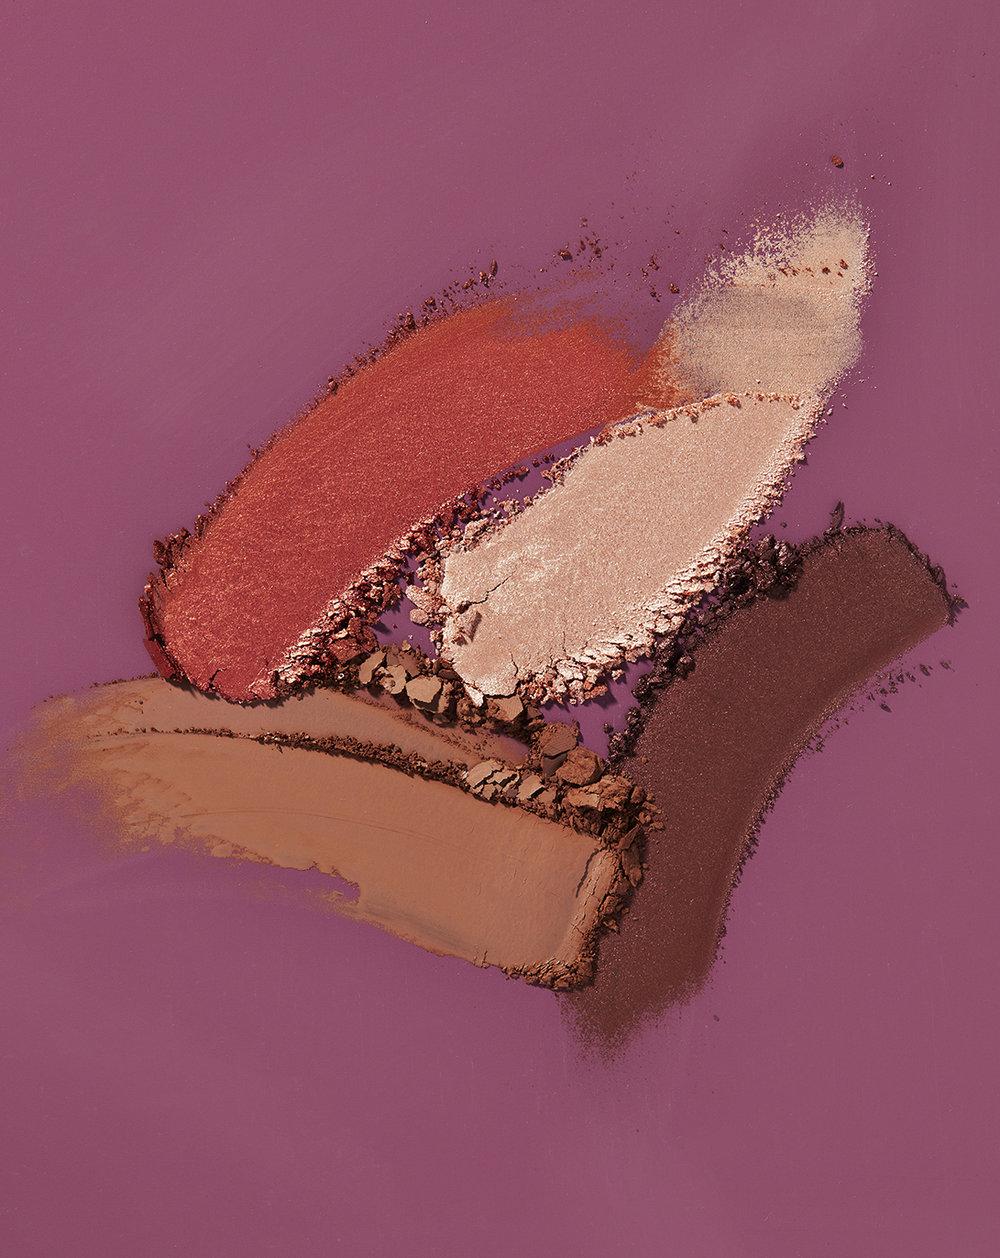 Jon Paterson_Cosmetics_Textures041.jpg